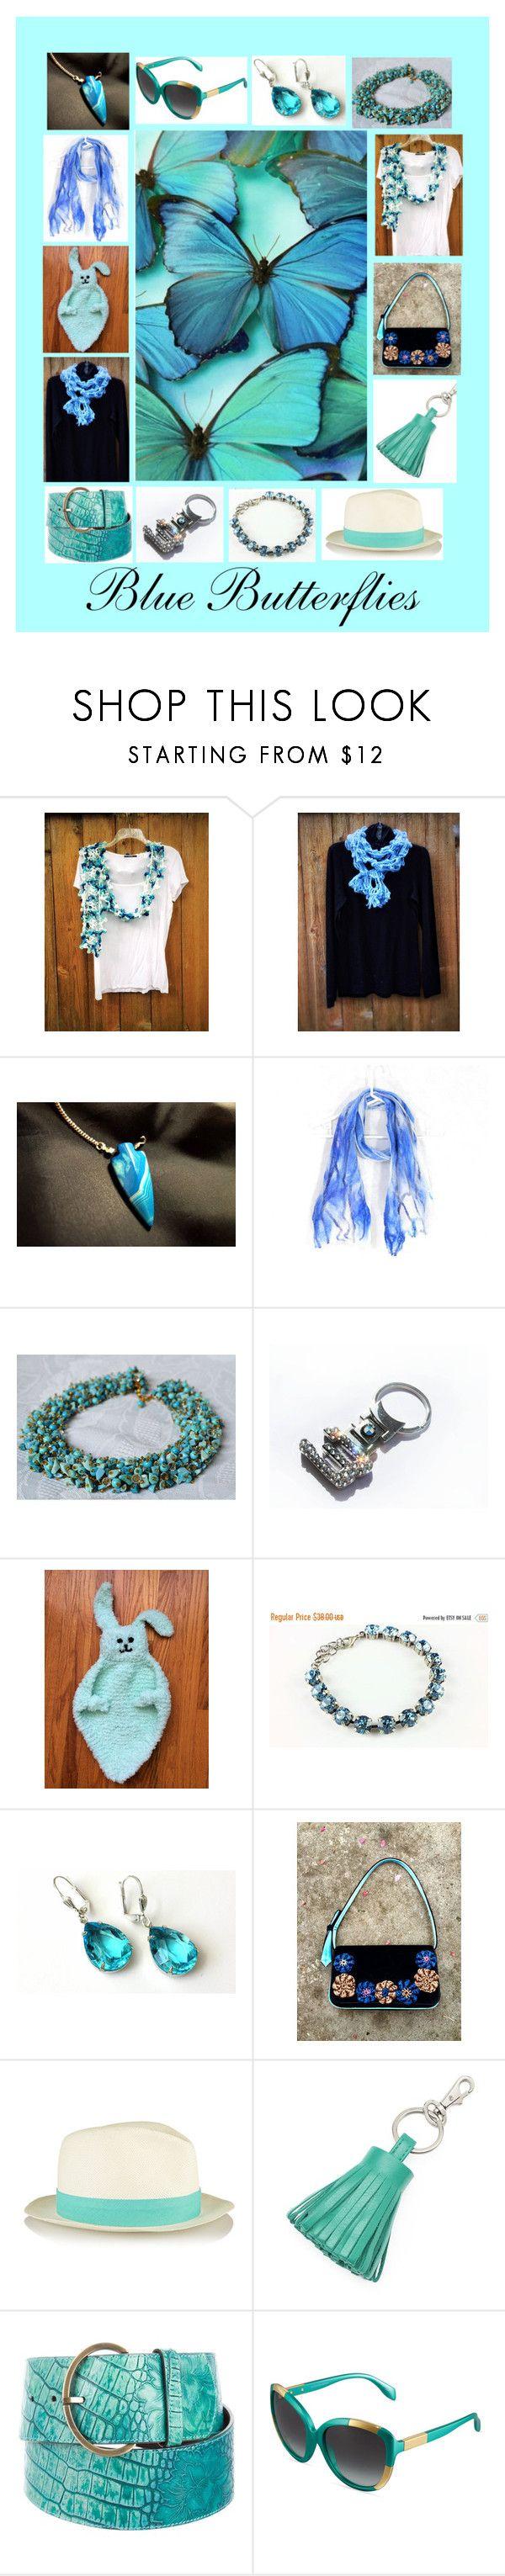 """Blue Butterflies: Winter Fashion Accessories"" by paulinemcewen on Polyvore featuring BMW, ILI, Oscar de la Renta and Alexander McQueen"